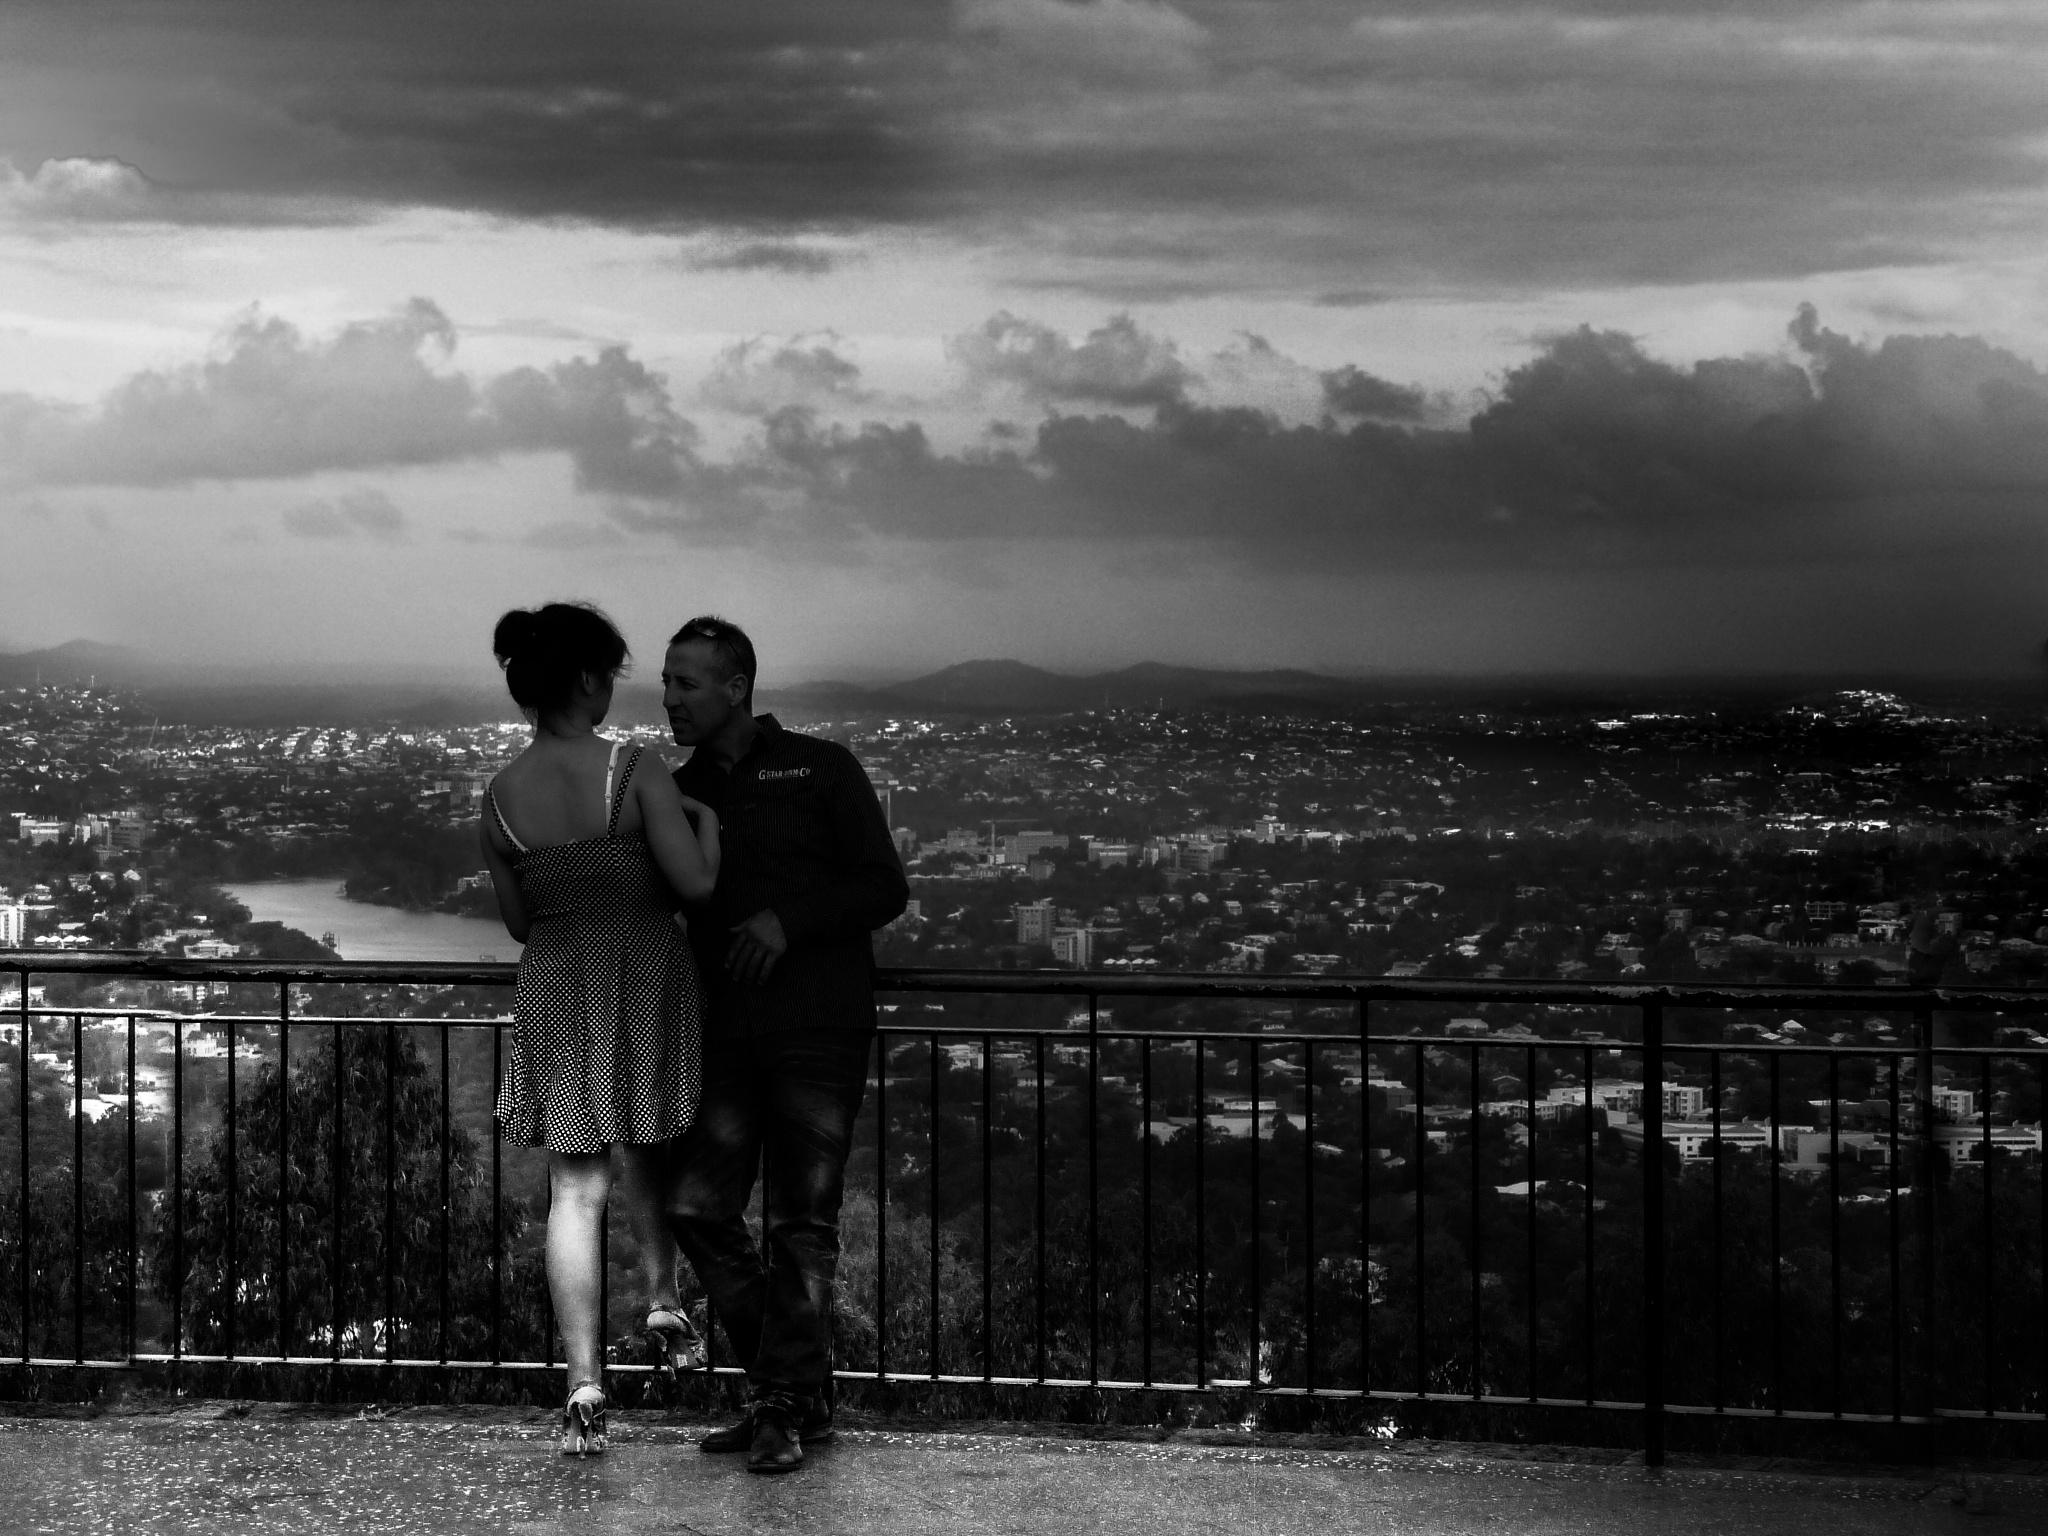 promiseMe by Max Evans